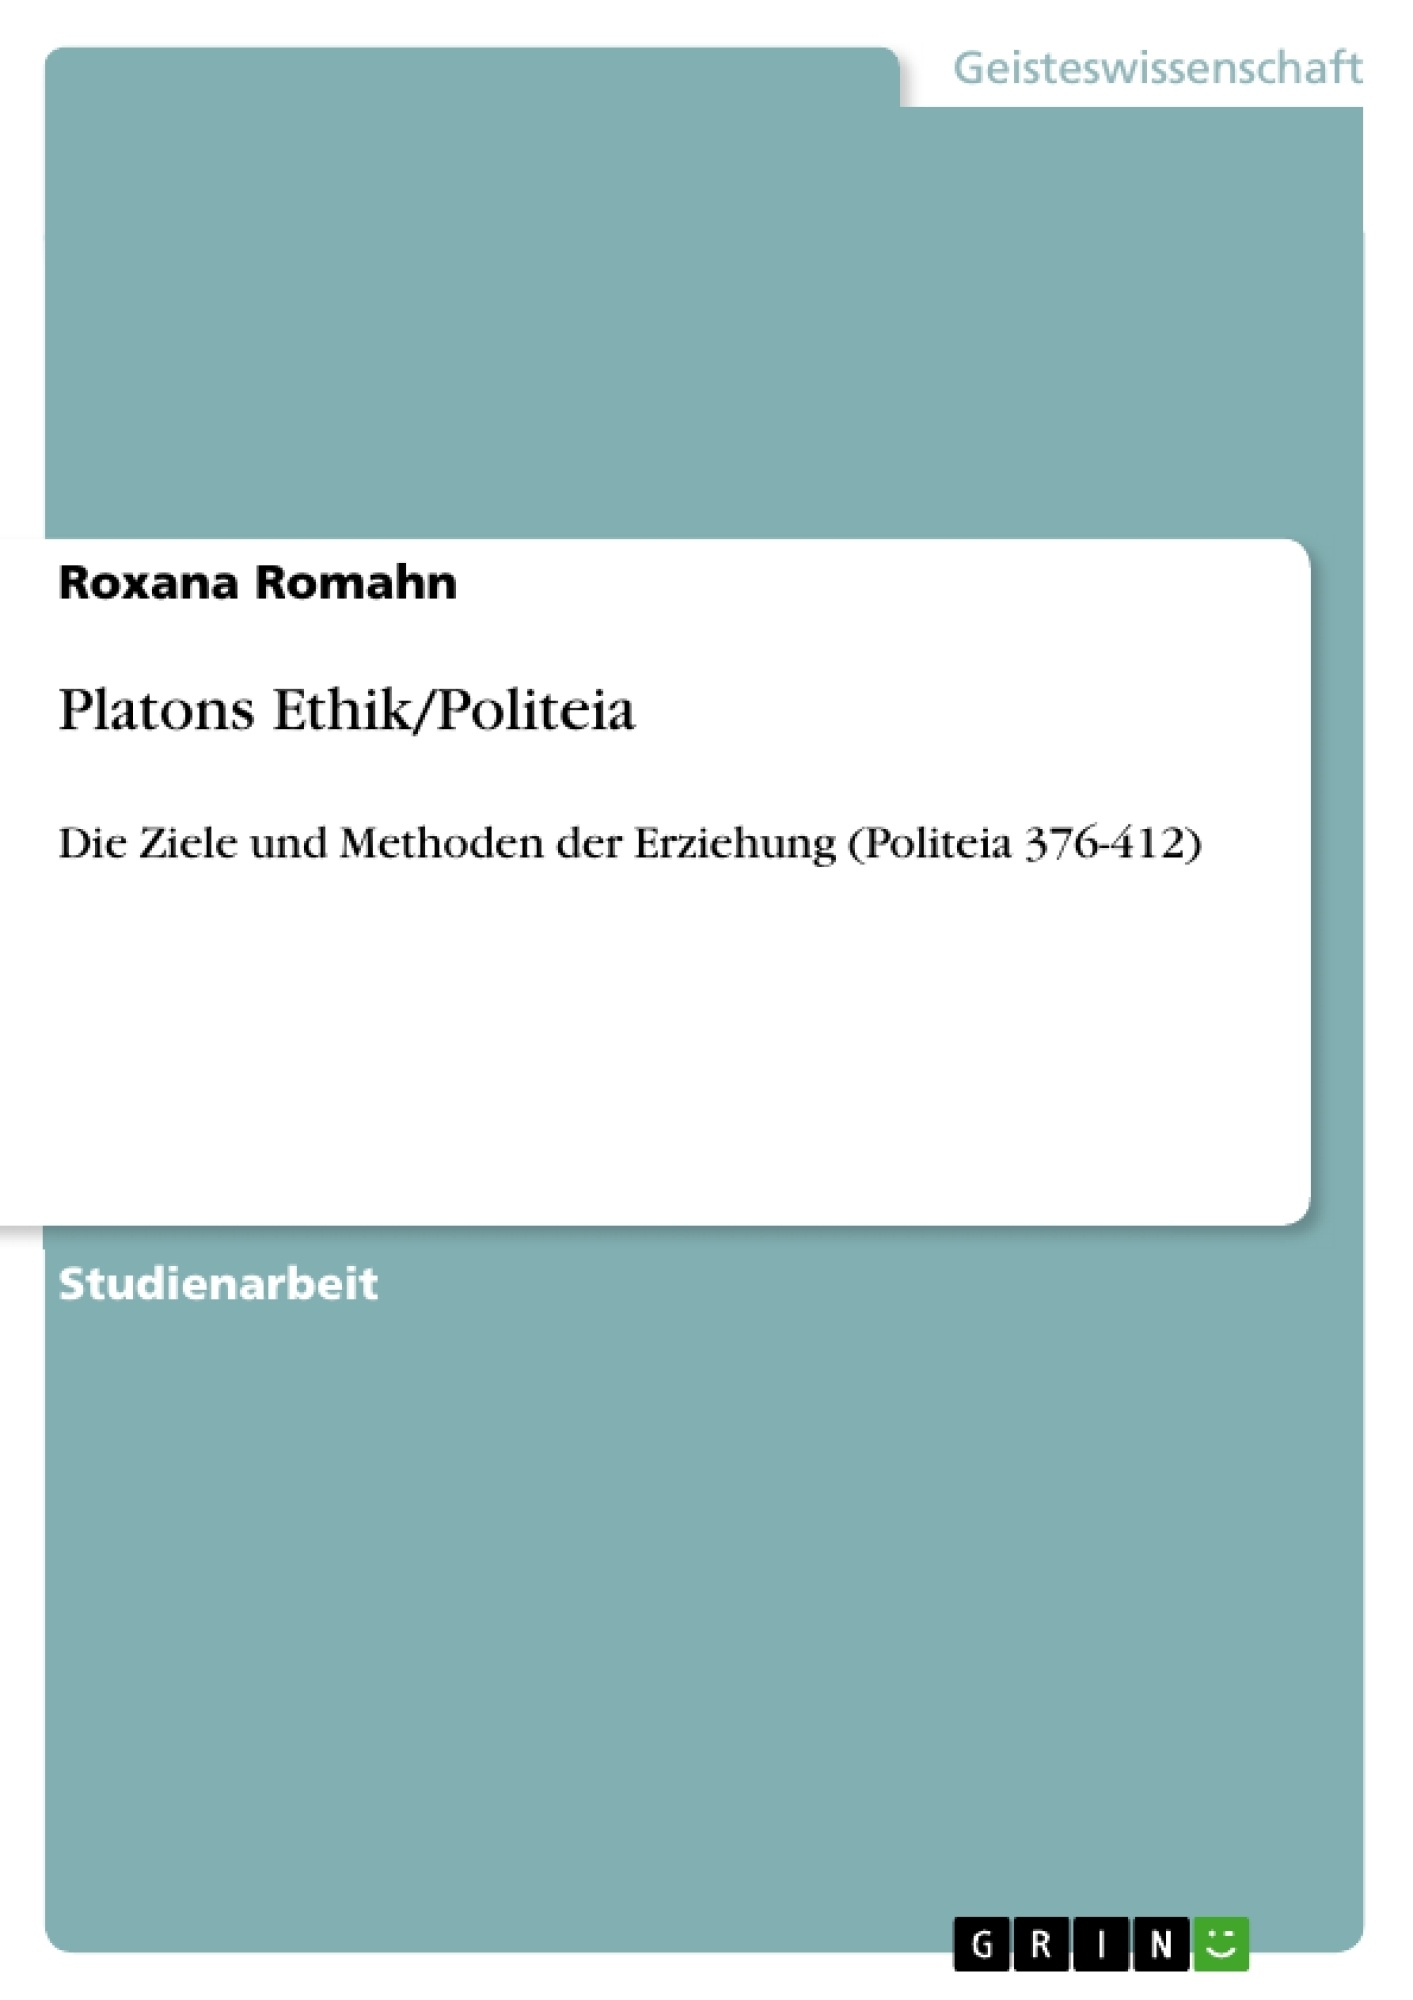 Titel: Platons Ethik/Politeia